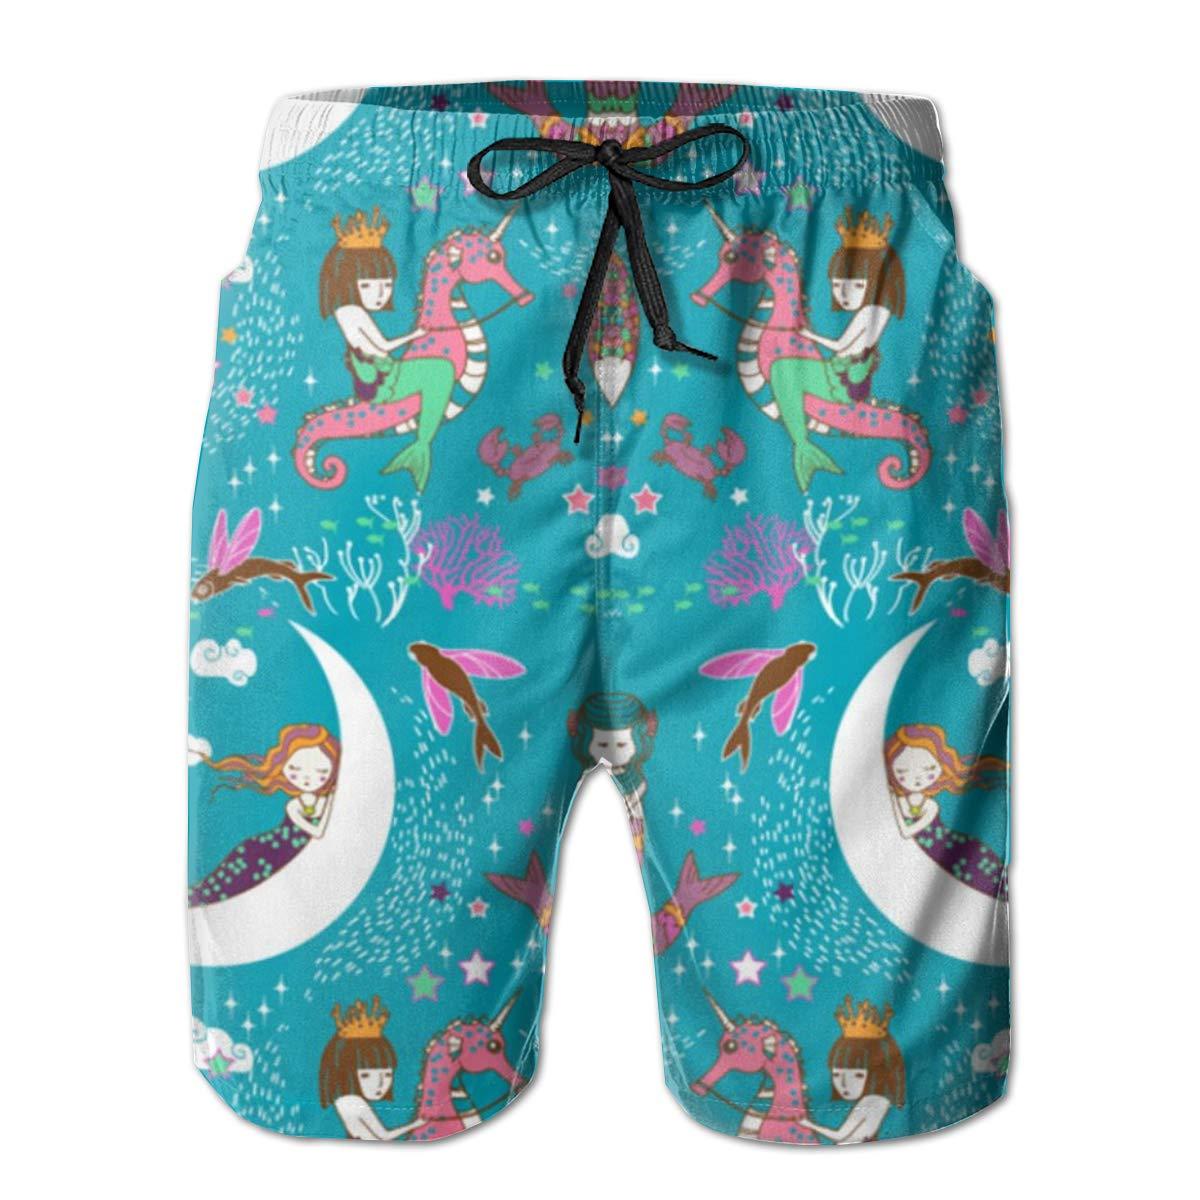 Mermaid Lullaby Small Mens Board Shorts Swim Mesh Lining and Side Pocket